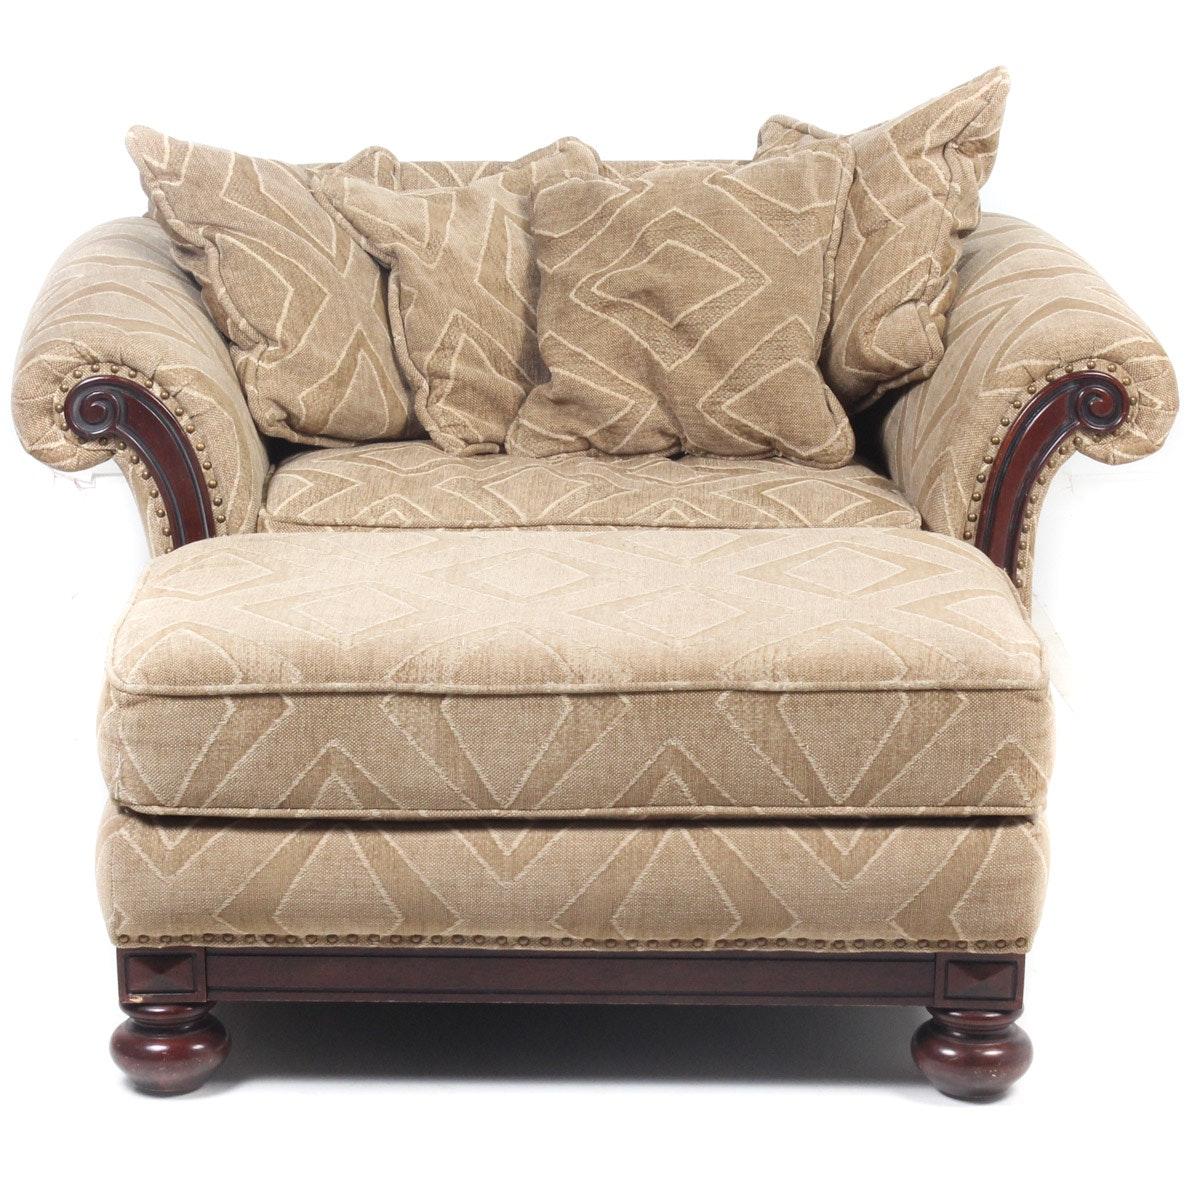 Bernhardt Upholstered Armchair and Ottoman